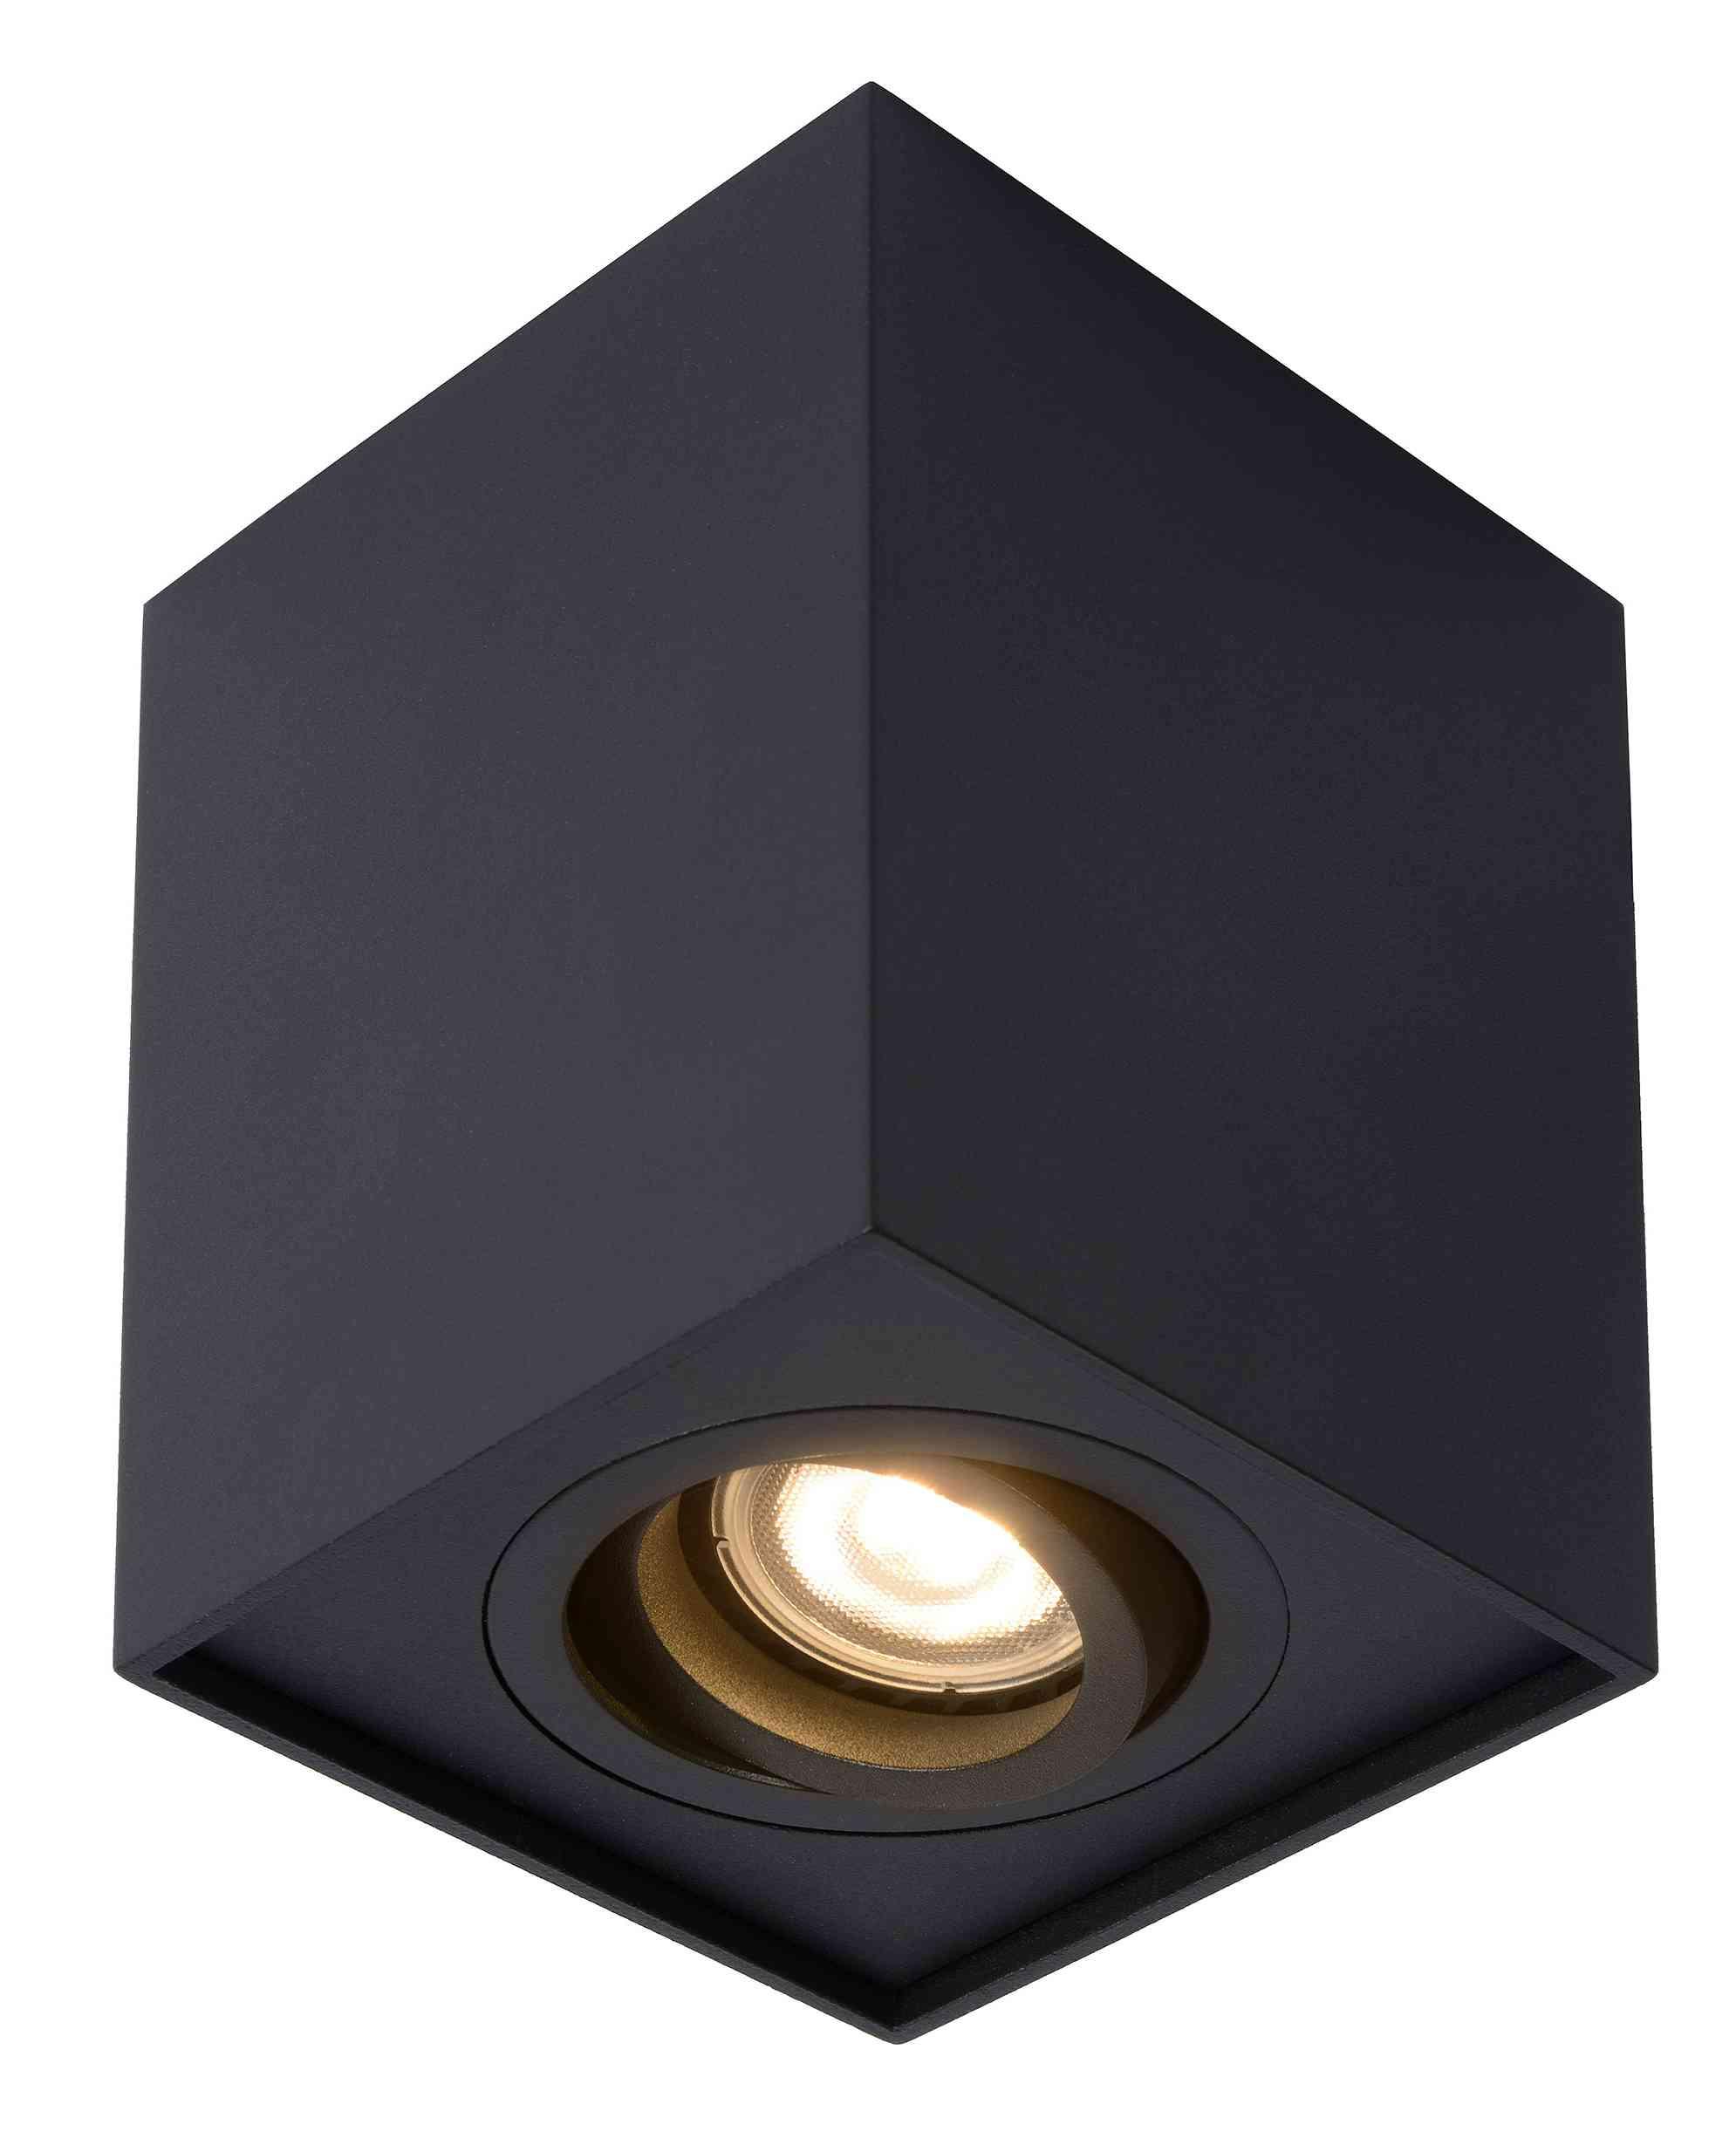 Lampa sufitowa TUBE - 82953/01/30